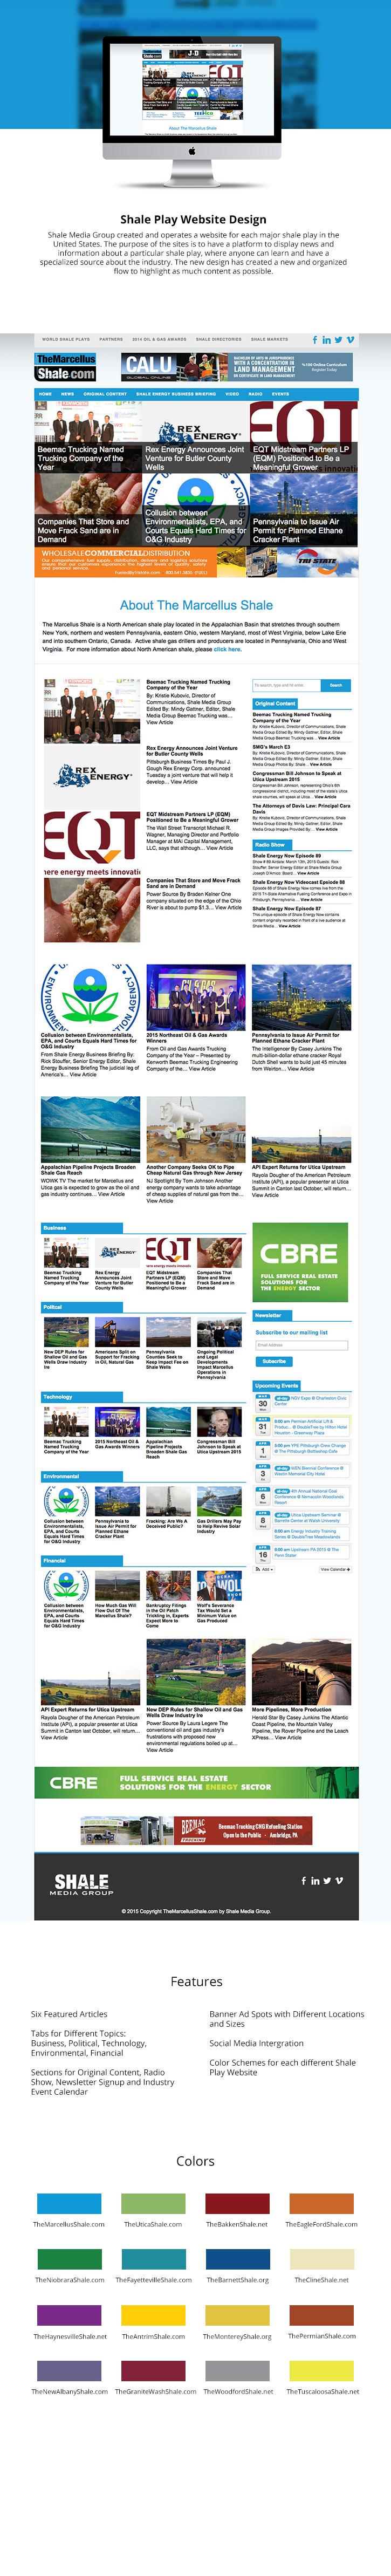 shale wordpress Web news